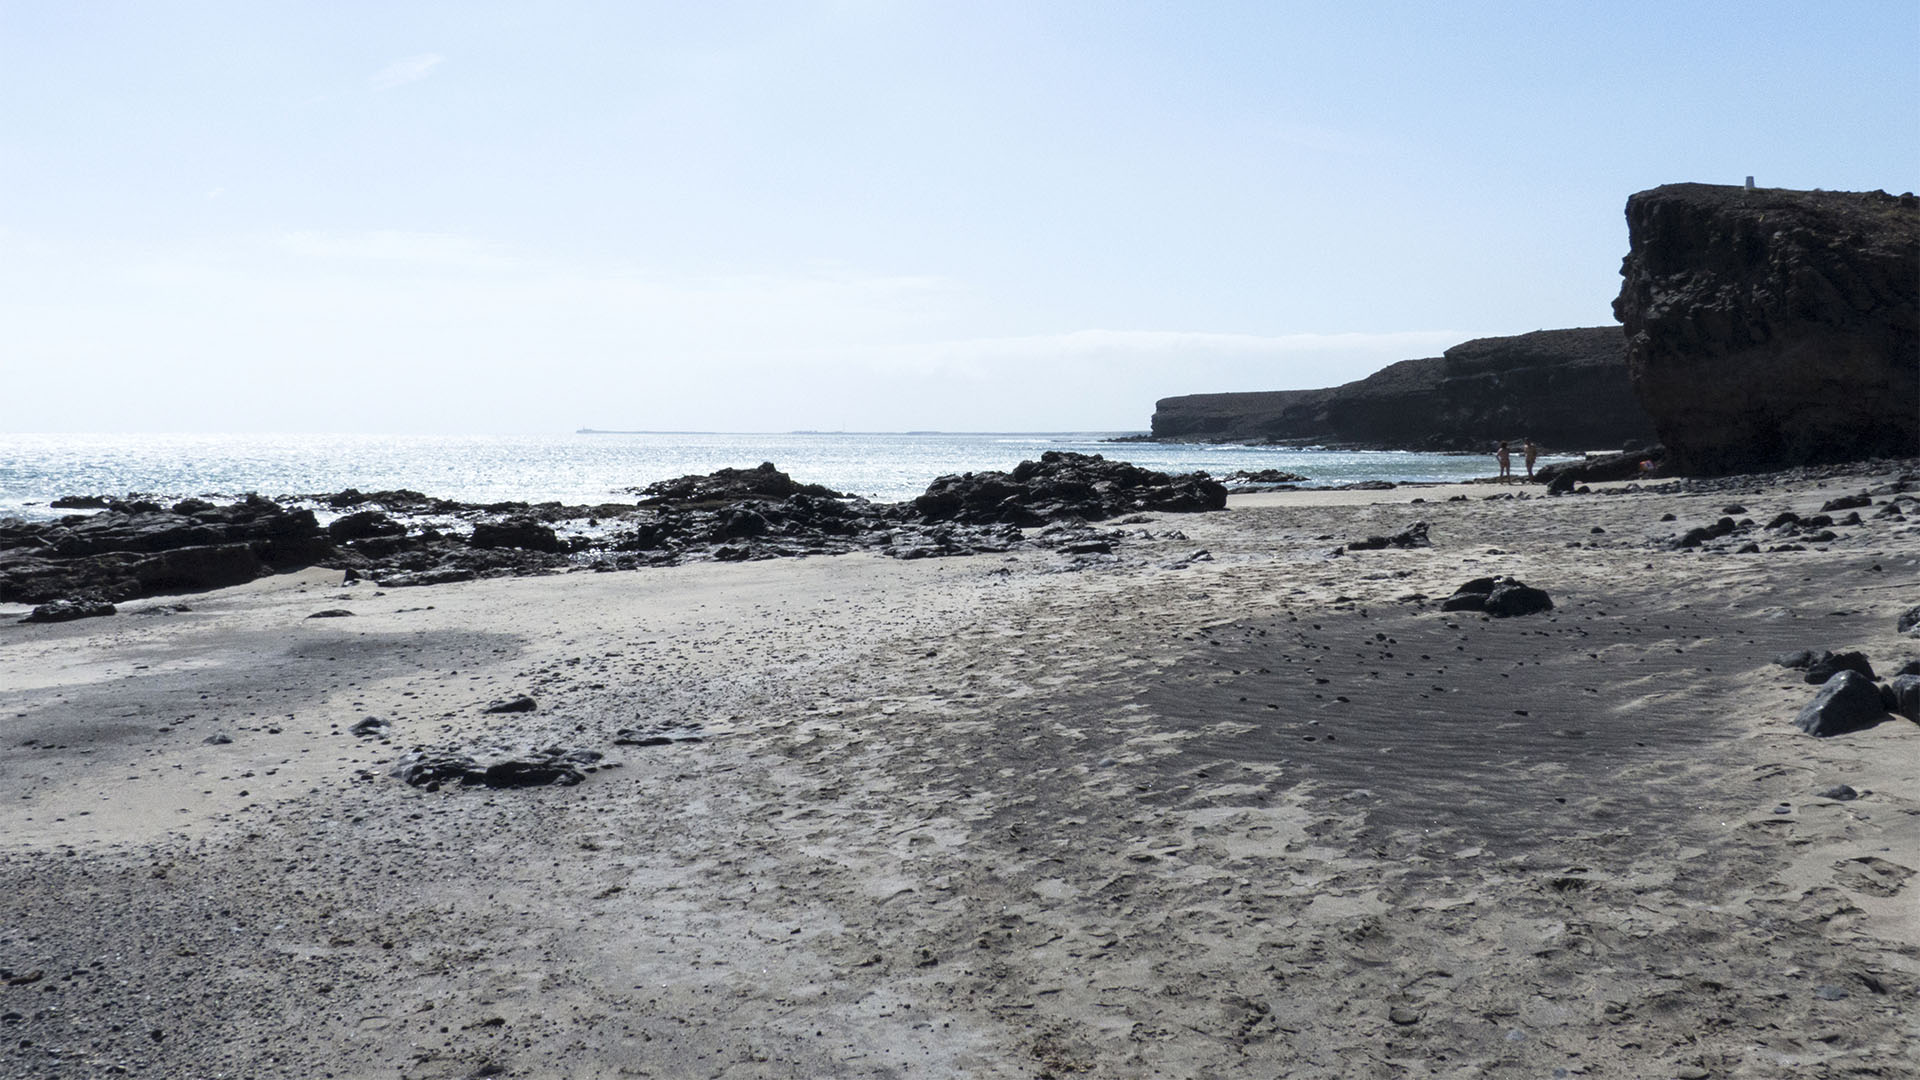 Die Strände Fuerteventuras: Punta del Viento.